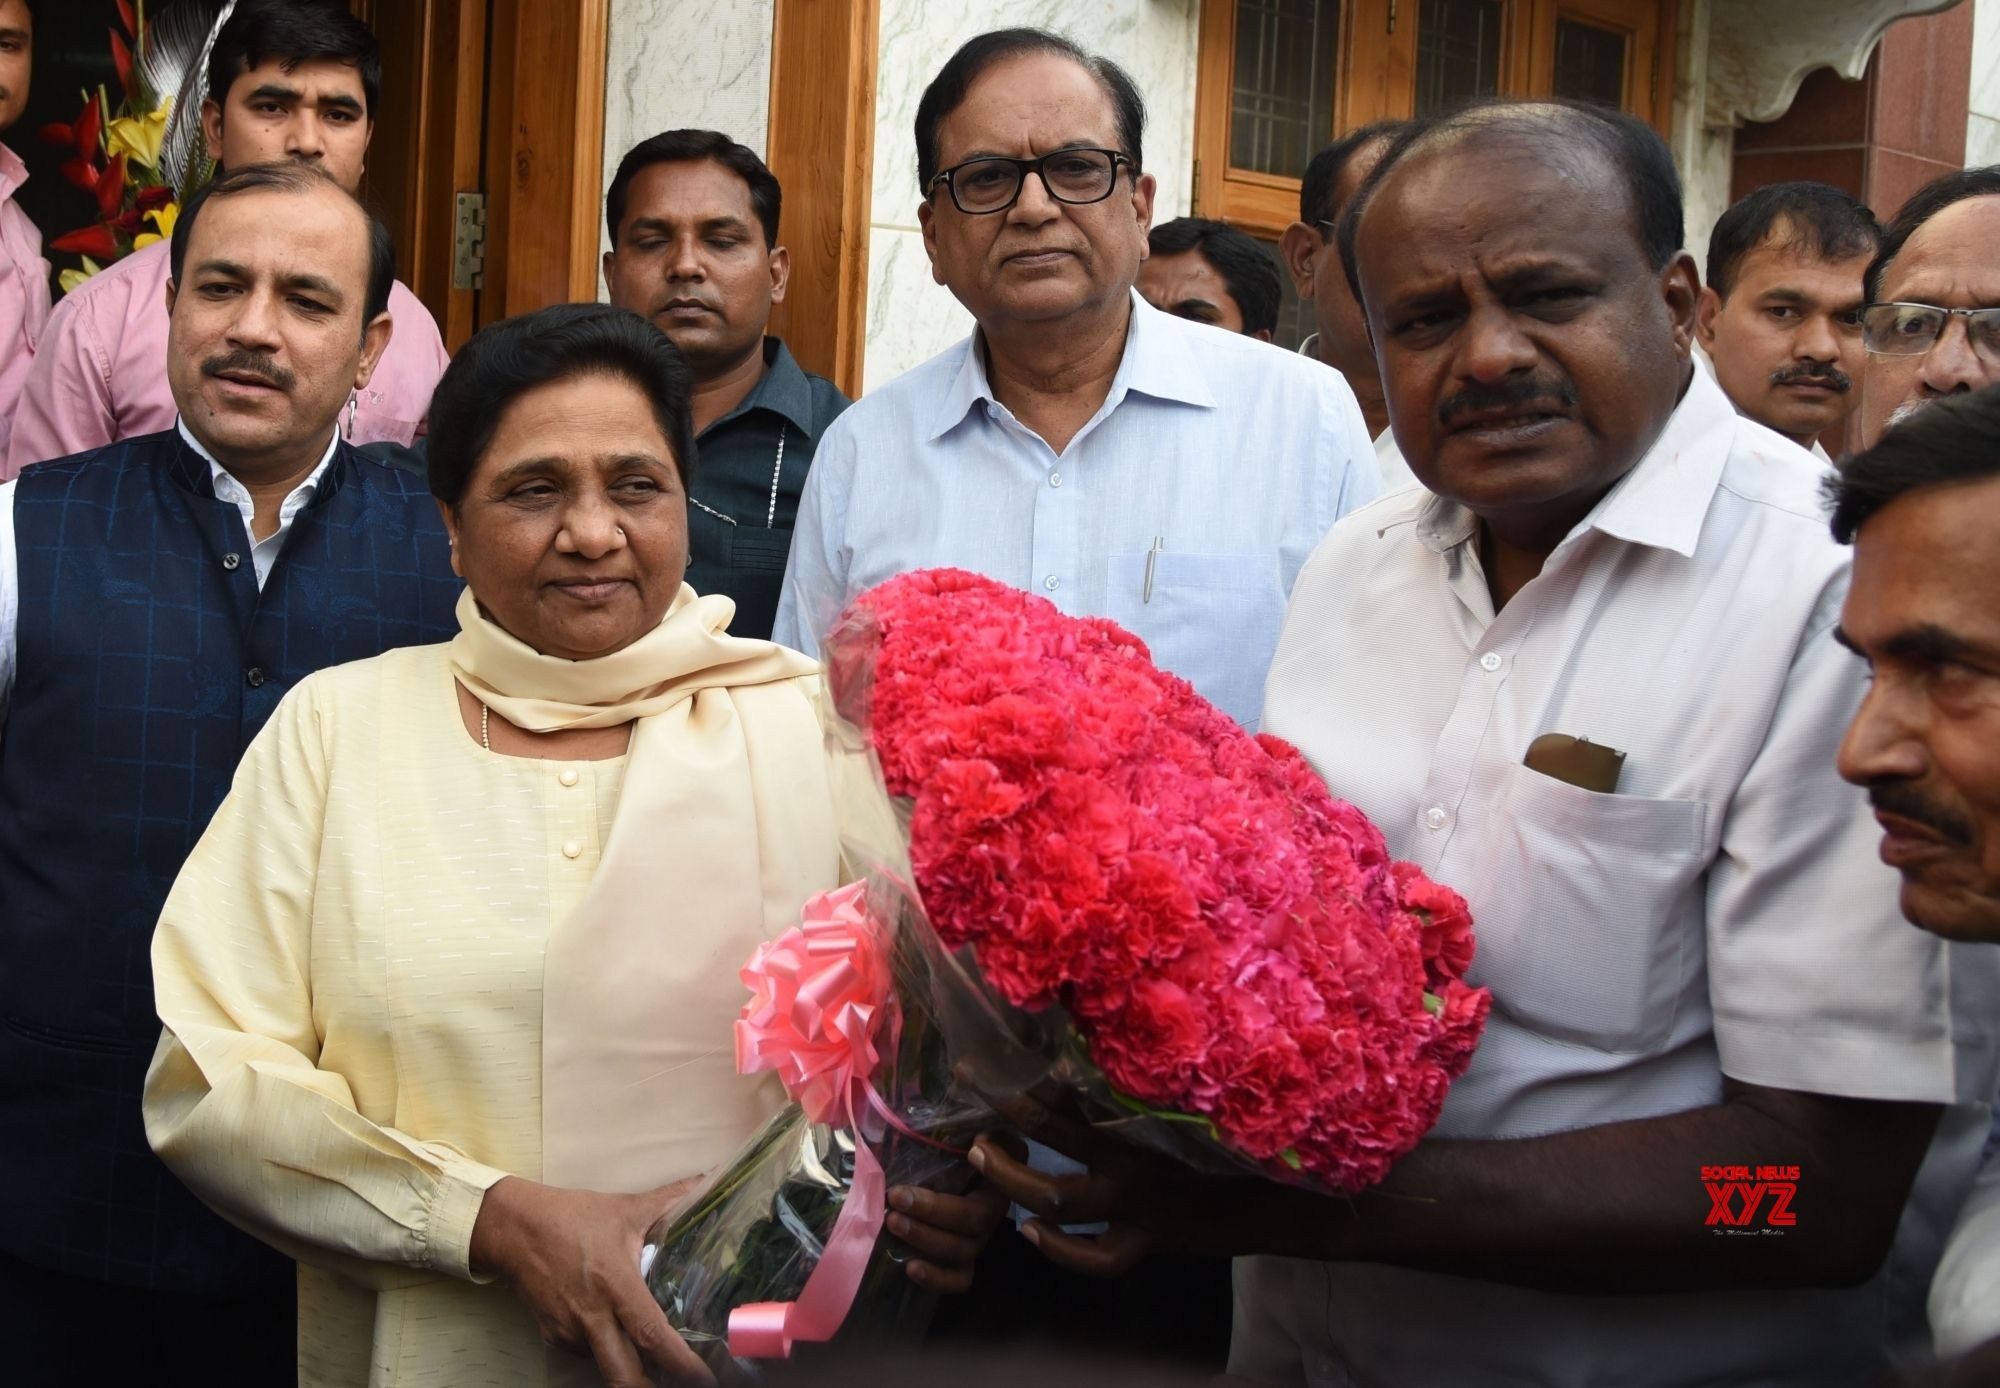 New Delhi: Janata Dal-Secular (JD-S) leader and Karnataka Chief Minister-designate H.D. Kumaraswamy meets BSP chief Mayawati, in New Delhi on May 21, 2018. (Photo: IANS)